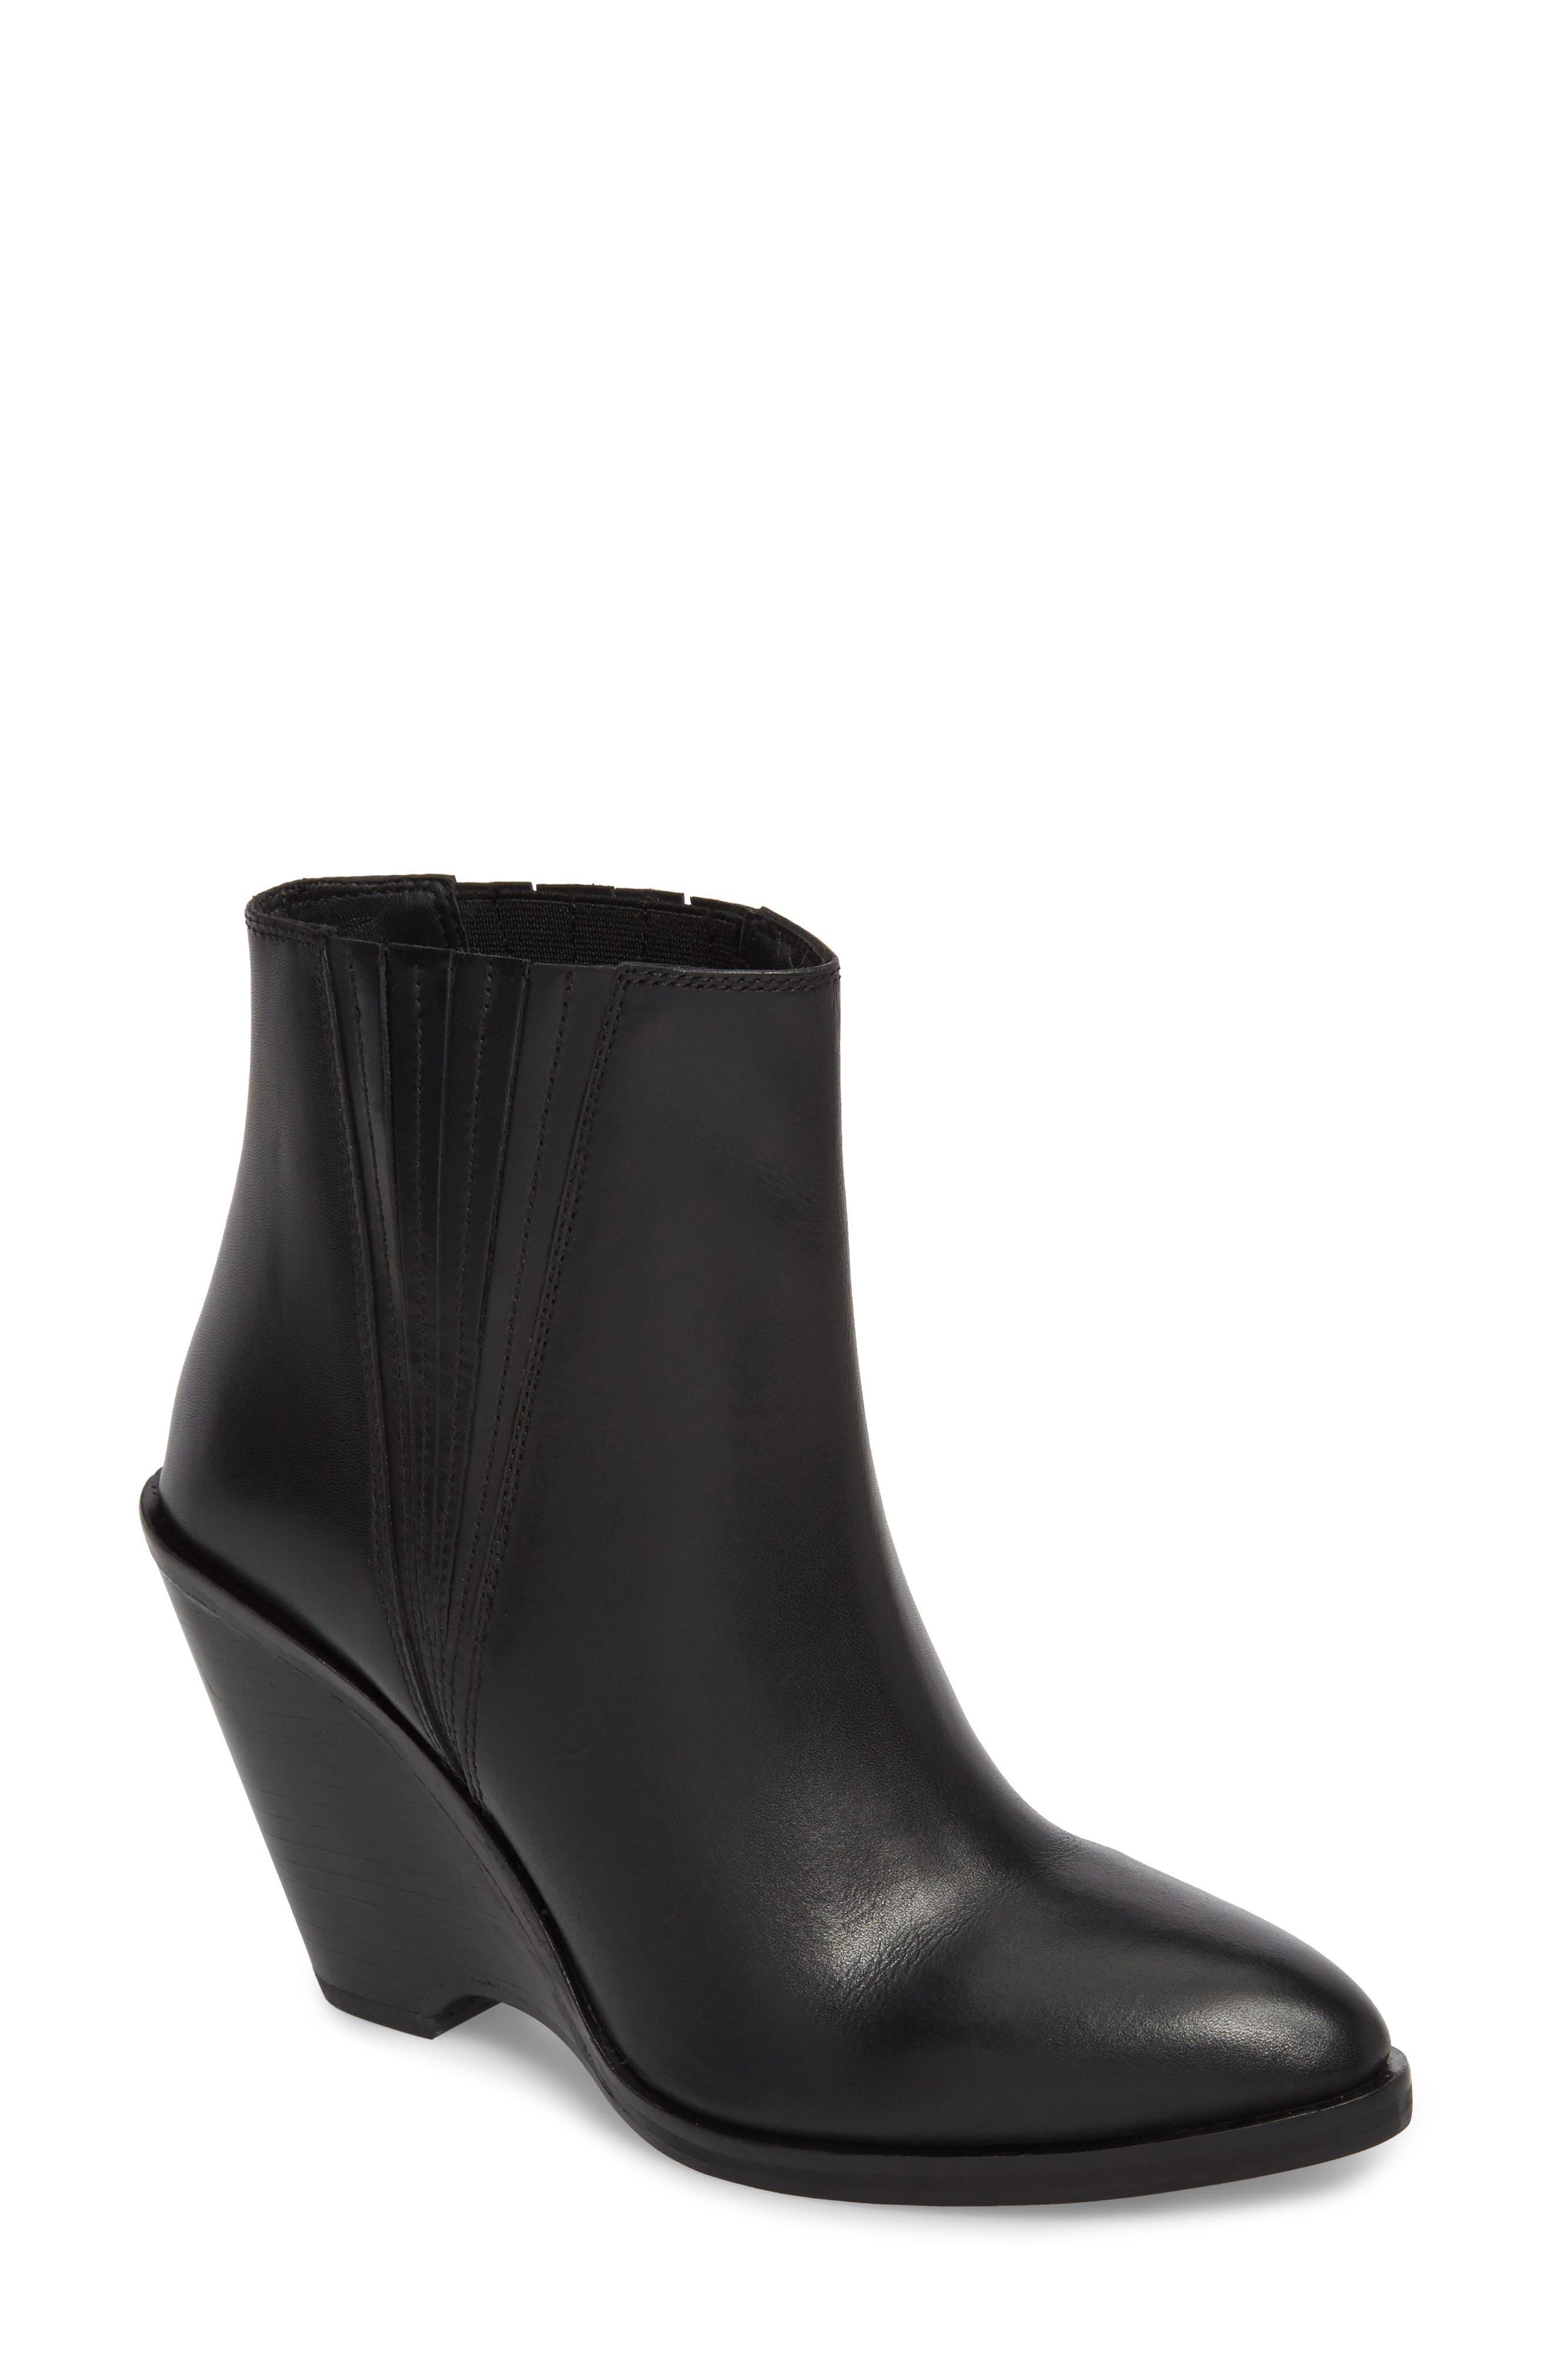 Seychelles Shoes Nordstrom Inside Flats Jazmine Black